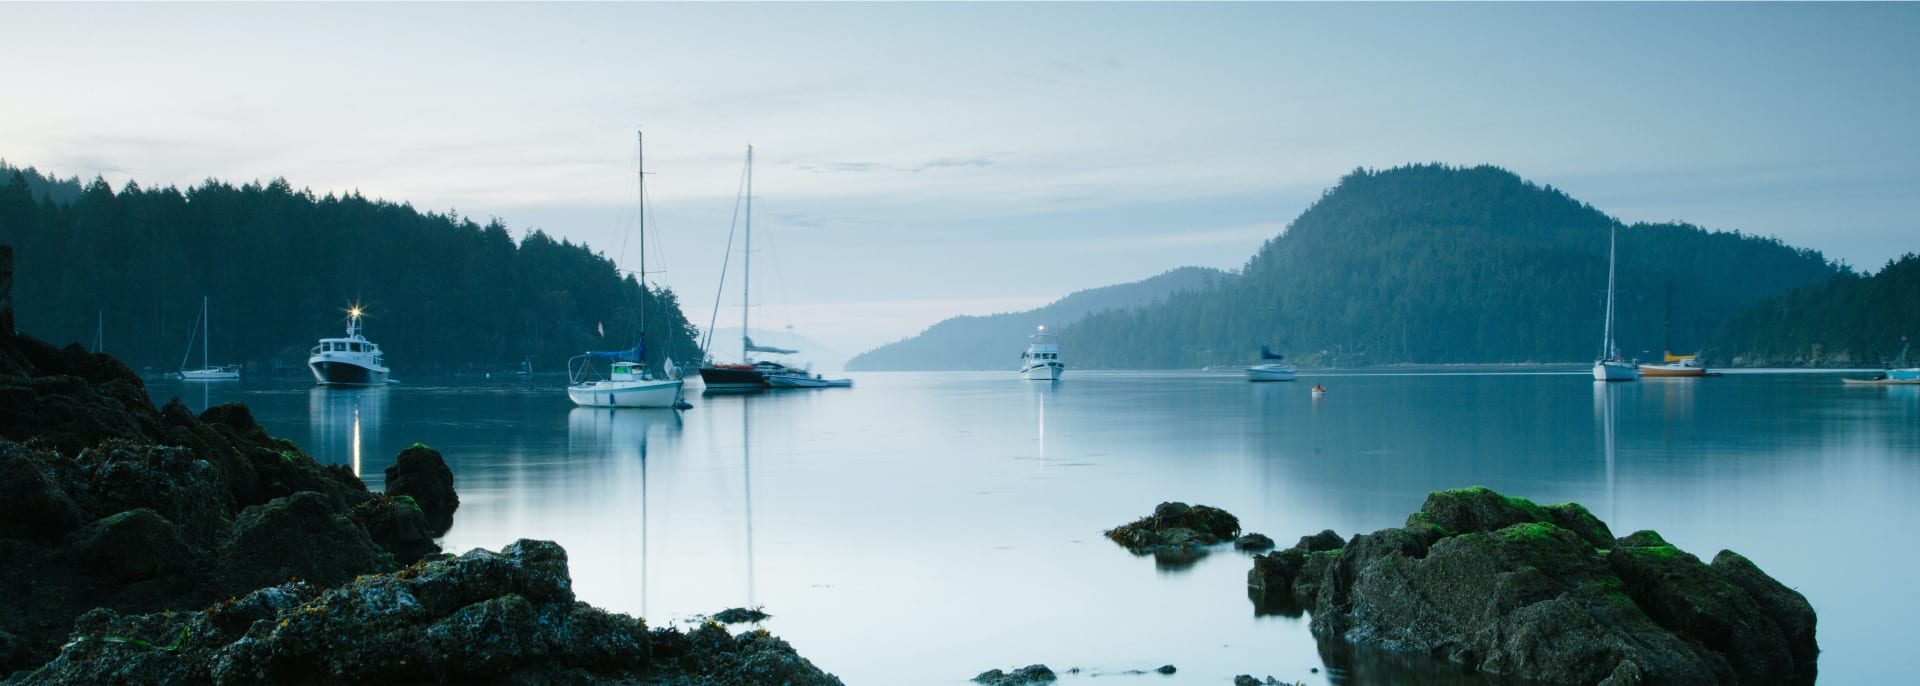 Pender Island, BC, Canada